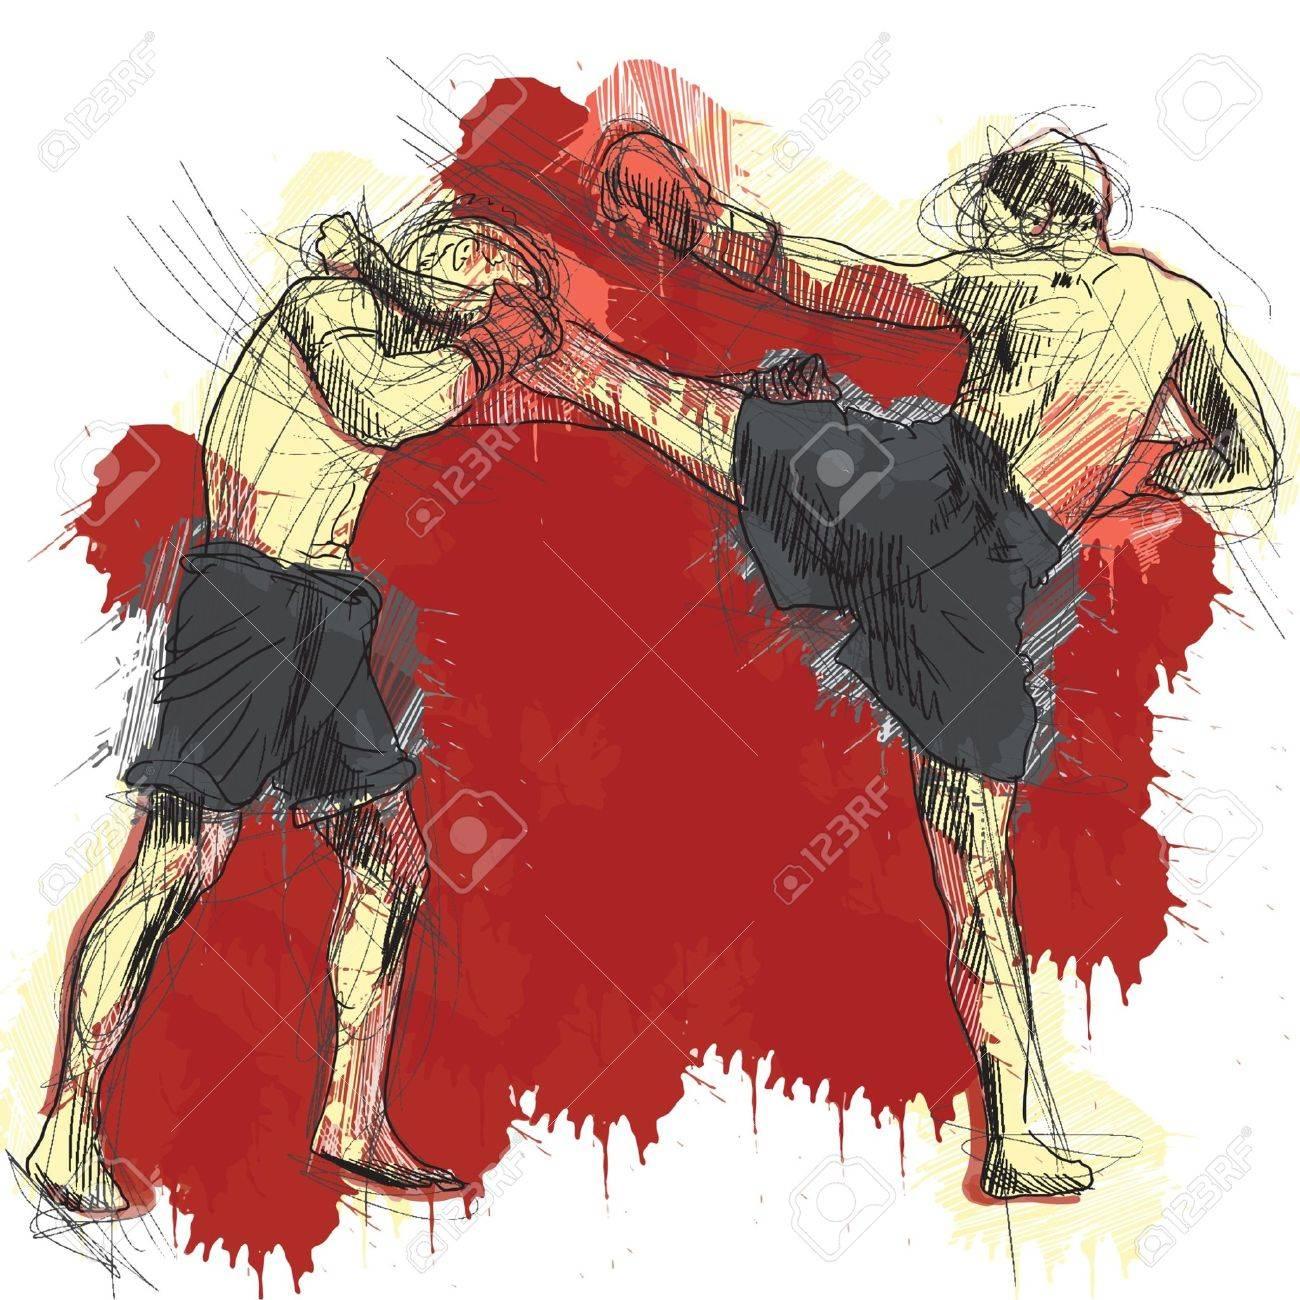 Muay Thai  combat martial art from Thailand  - Kickboxing Stock Vector - 18136085